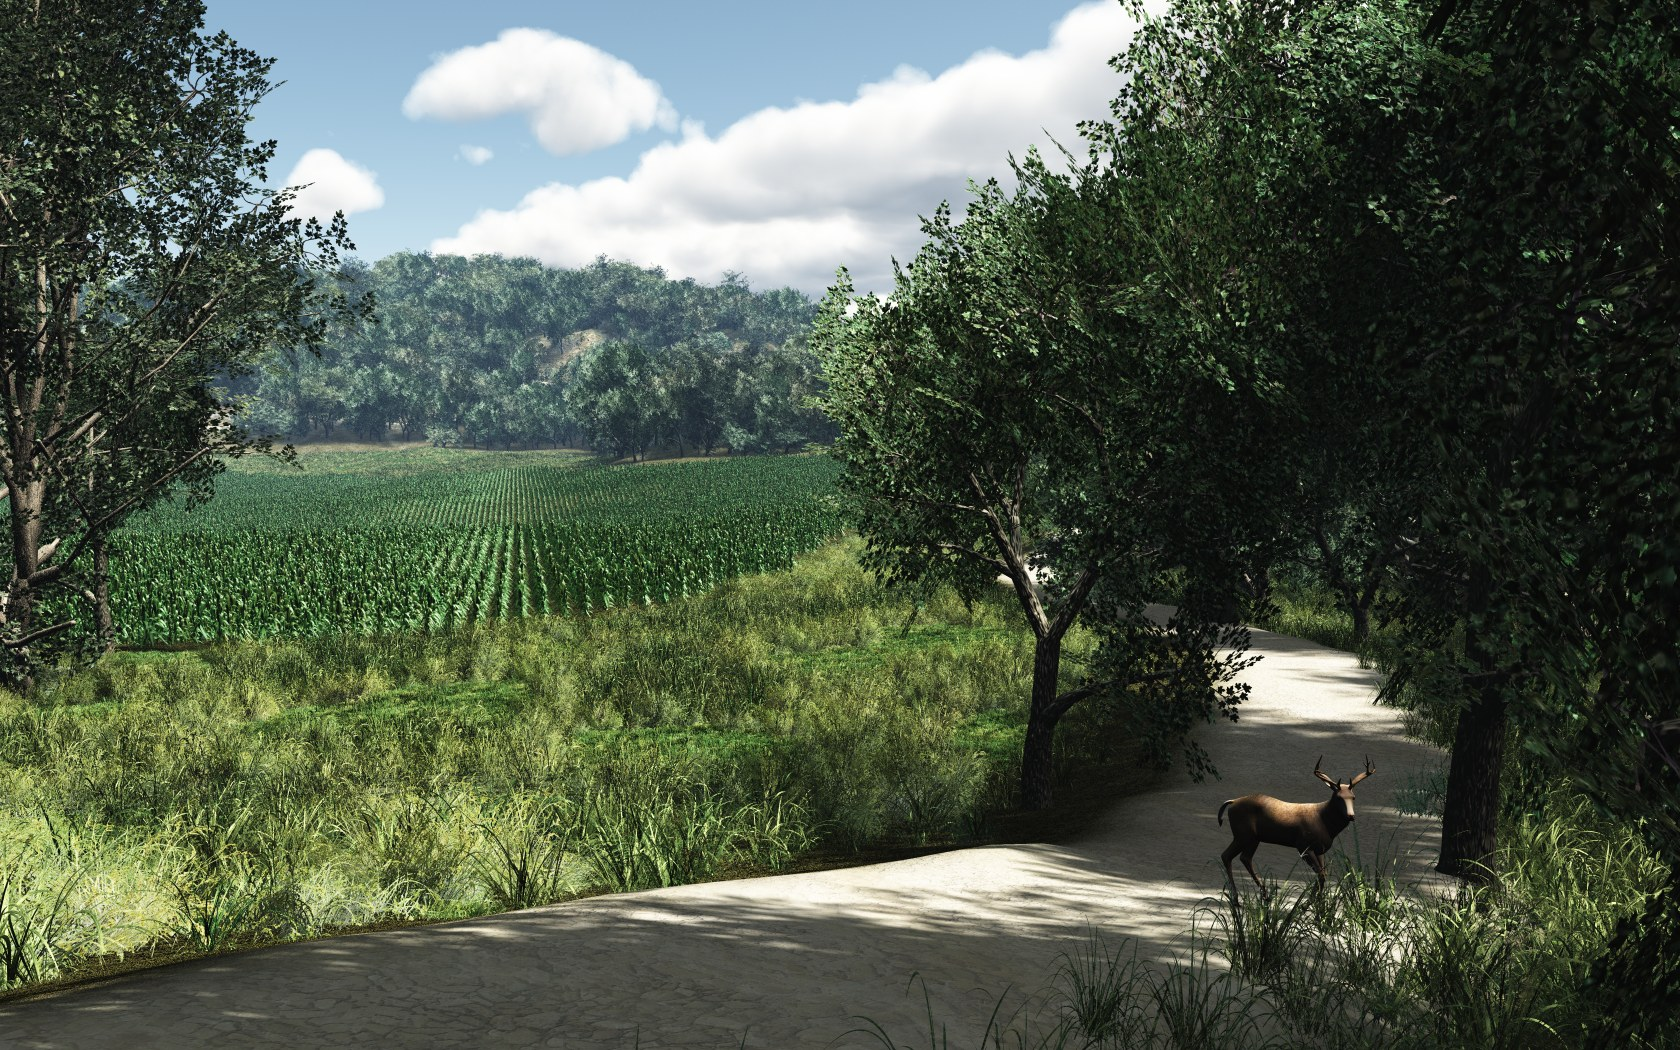 Farm Road by mainbearing